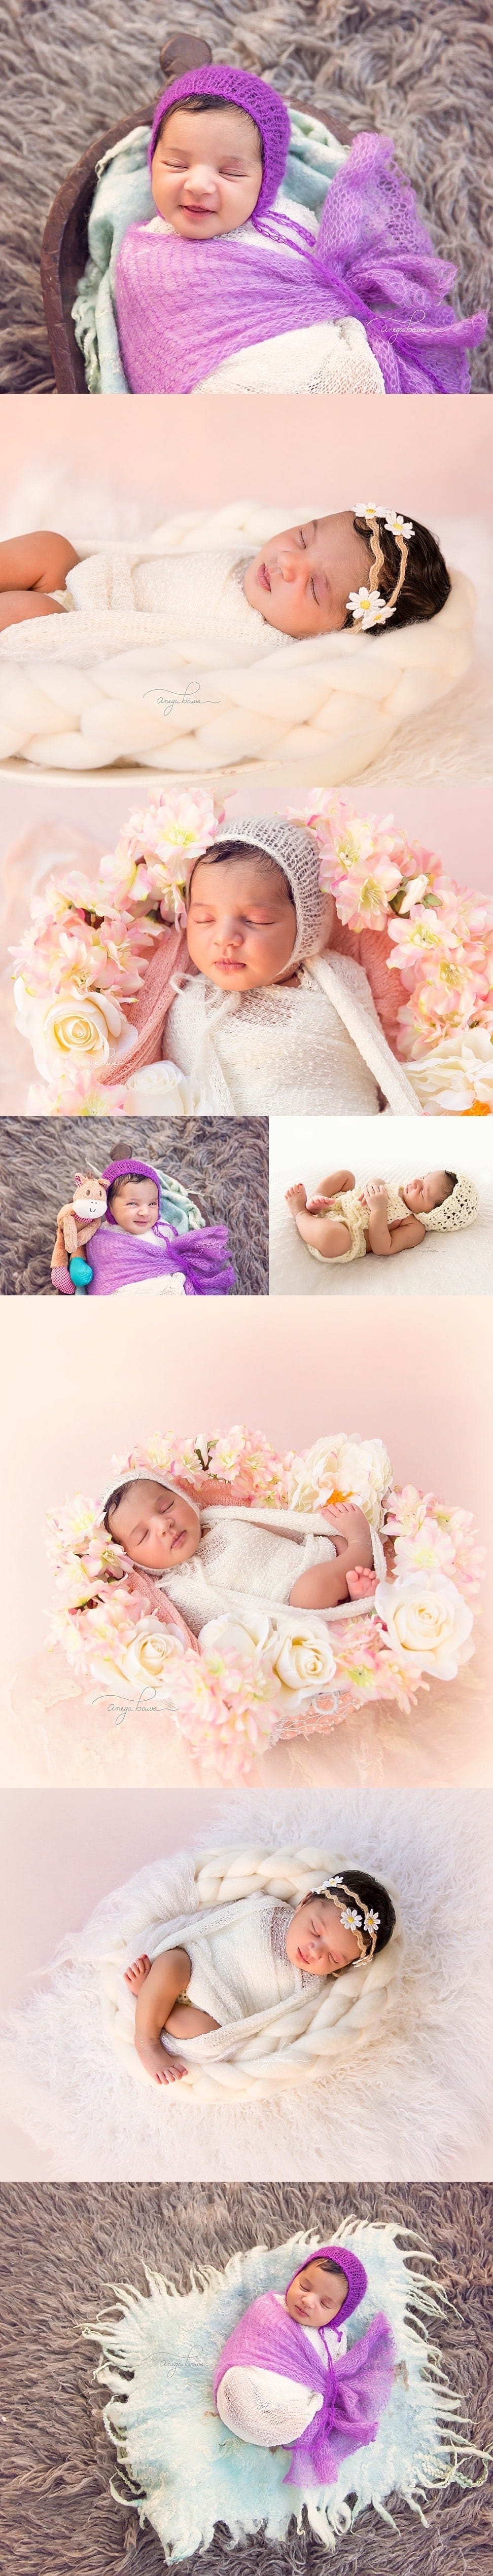 infant photography delhi